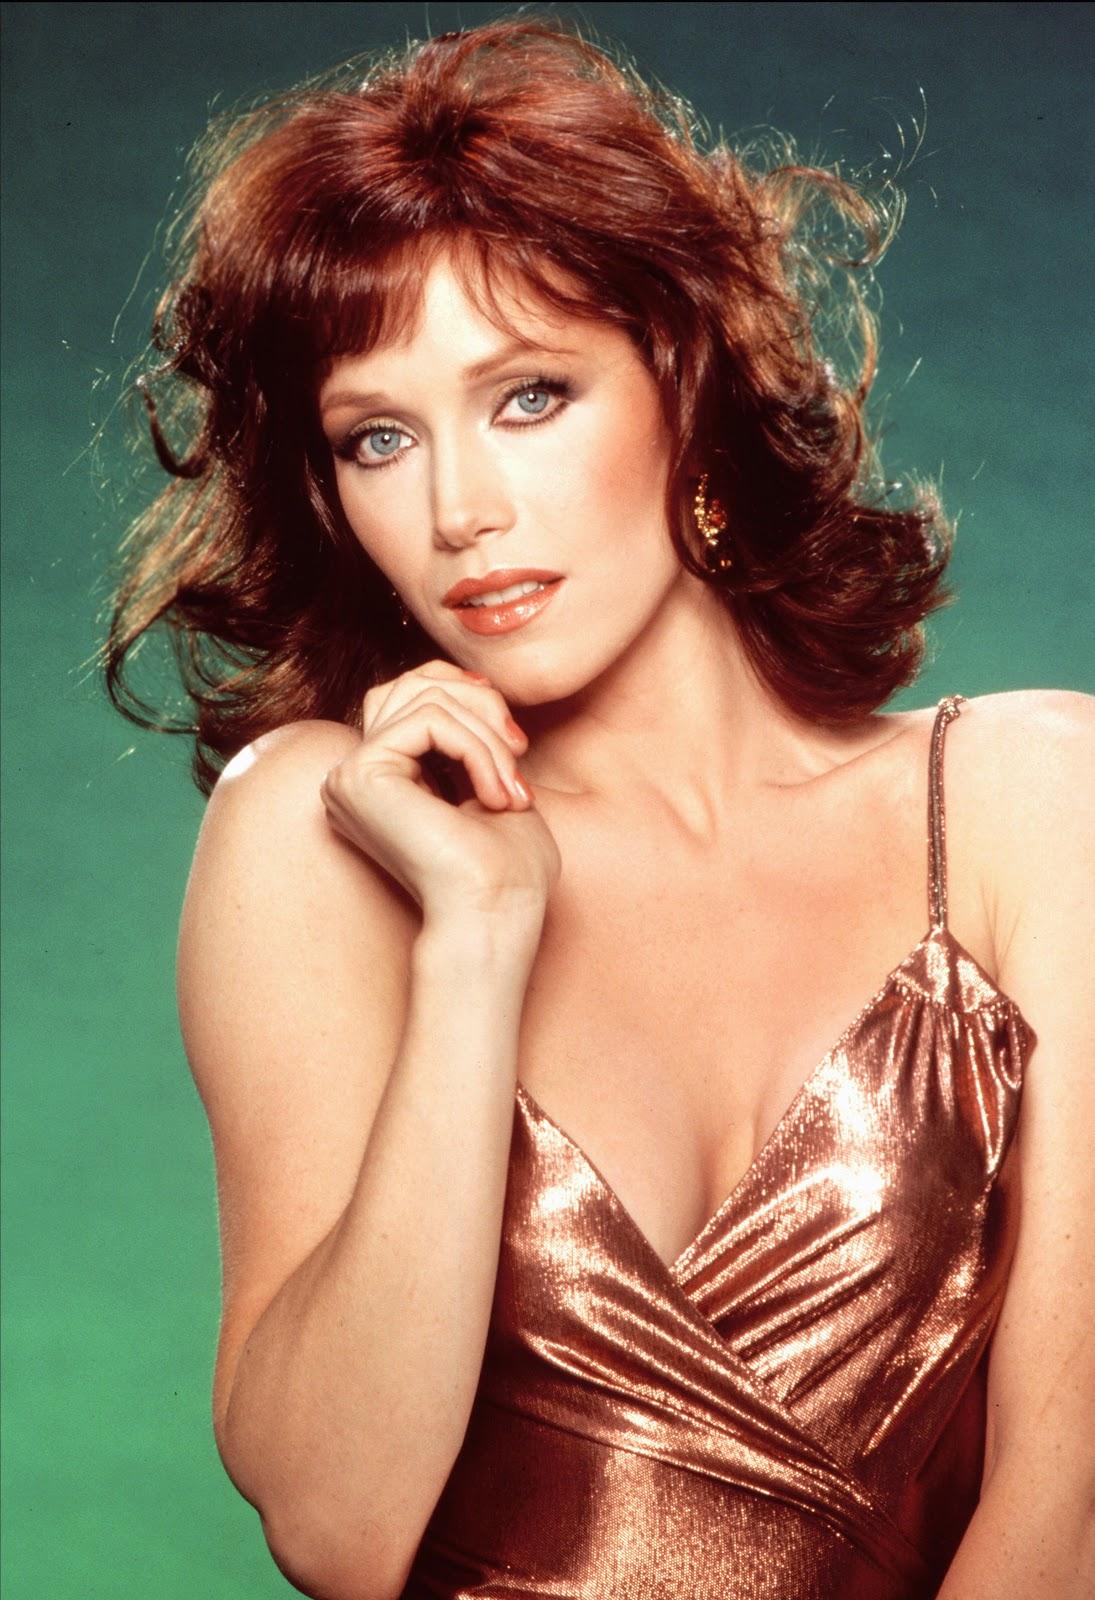 http://2.bp.blogspot.com/-ia4h5px0dGE/Tb2DtFv1m4I/AAAAAAAAHJE/4fVj1tRcHMY/s1600/Tanya_Roberts-1980s-UHQ_Pictures_001.jpg